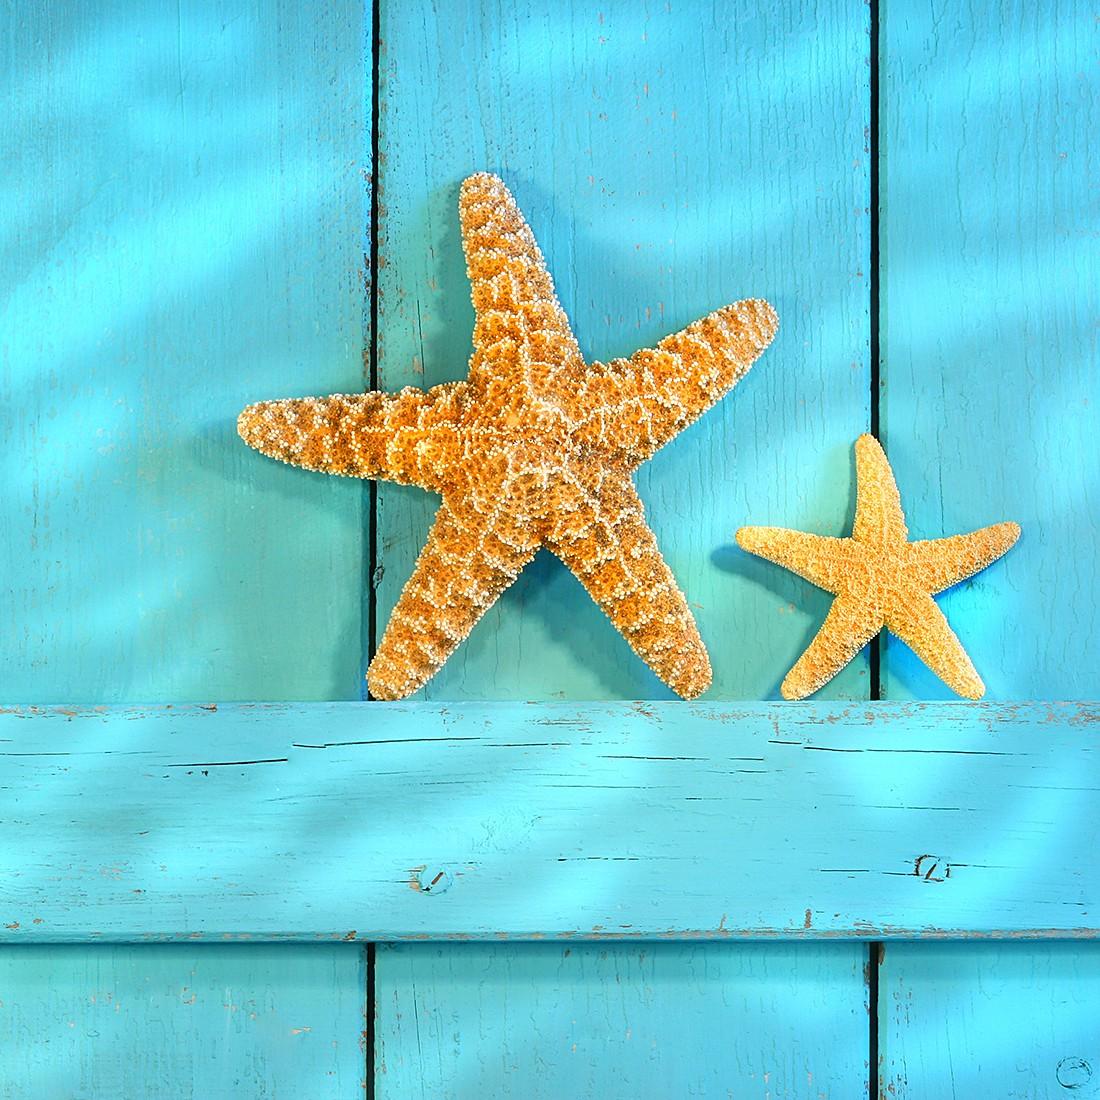 Glasbild Starfish 30x30, Pro Art